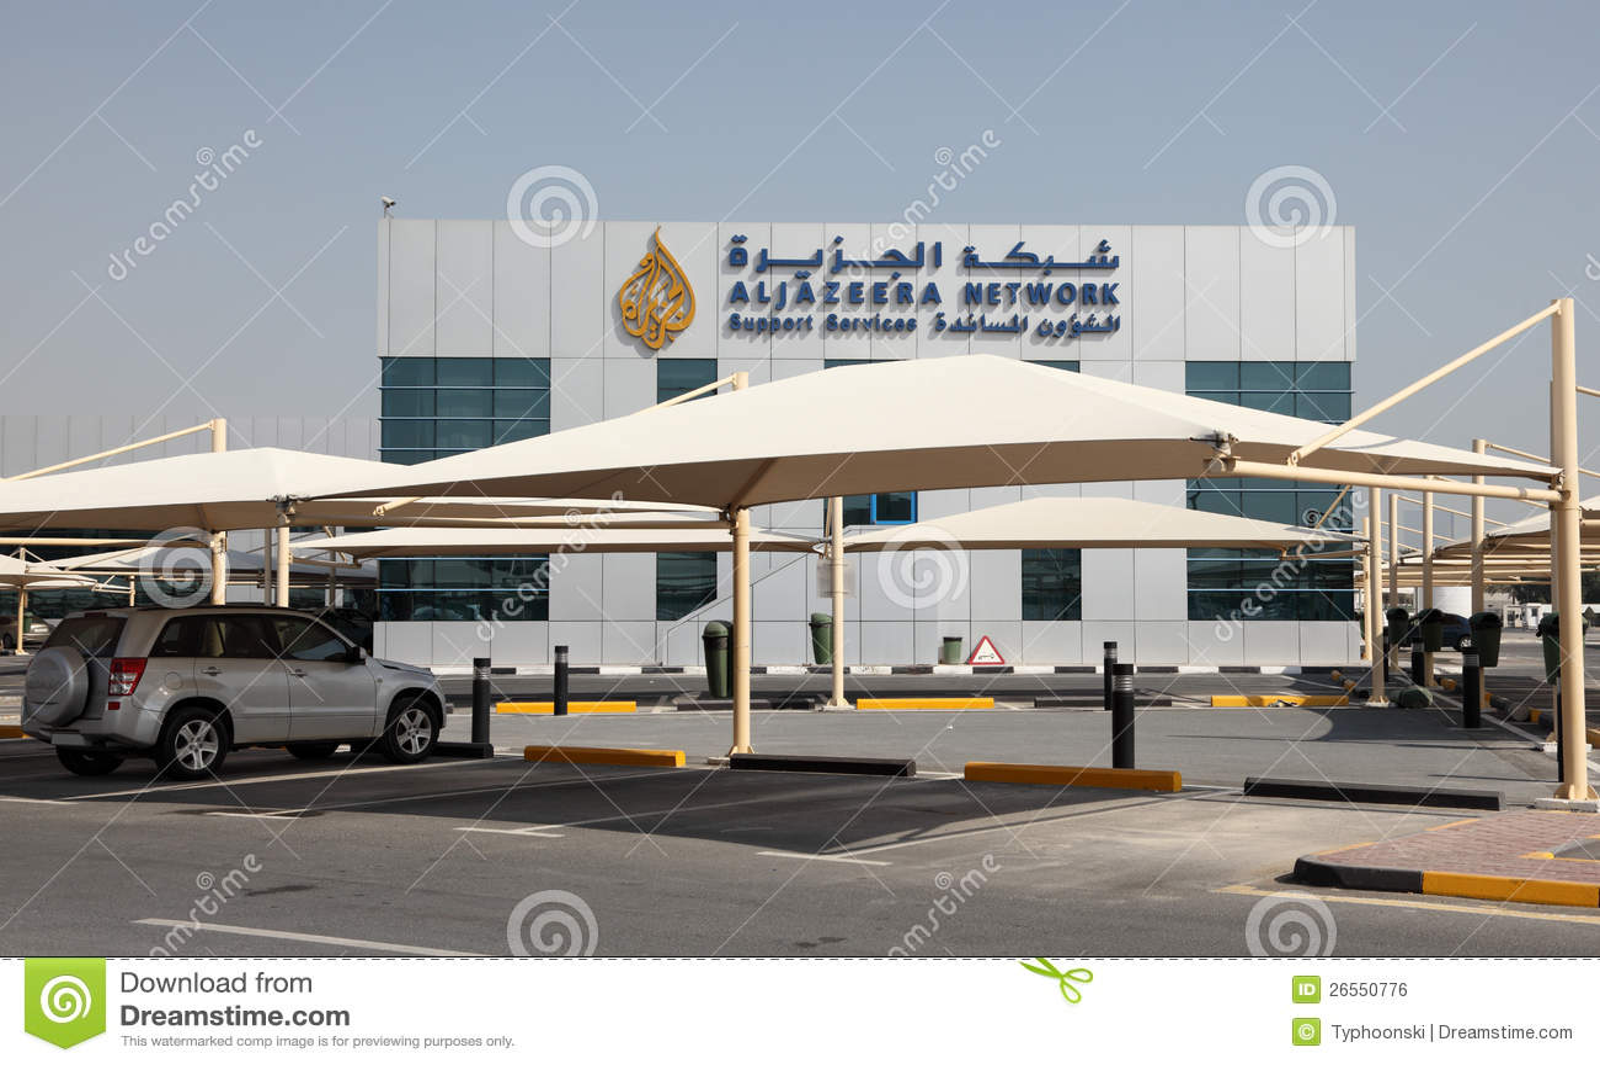 Al Jazeera Network, Doha